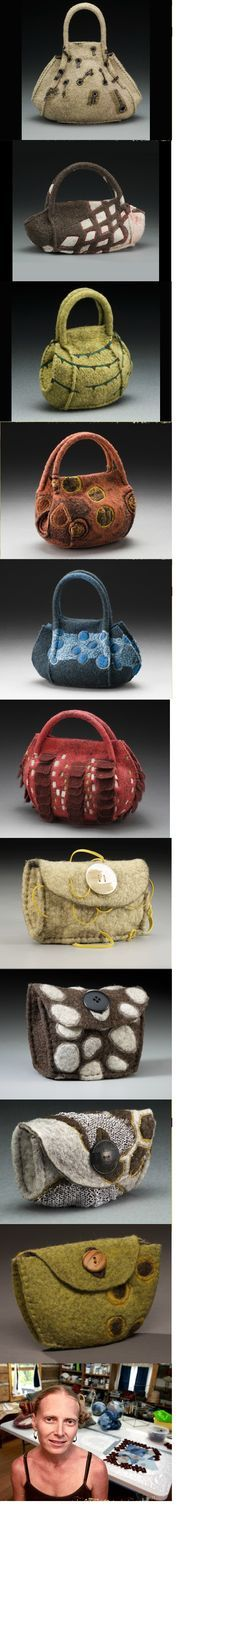 Lisa Klakulak's amazing handbags. http://www.strongfelt.com/